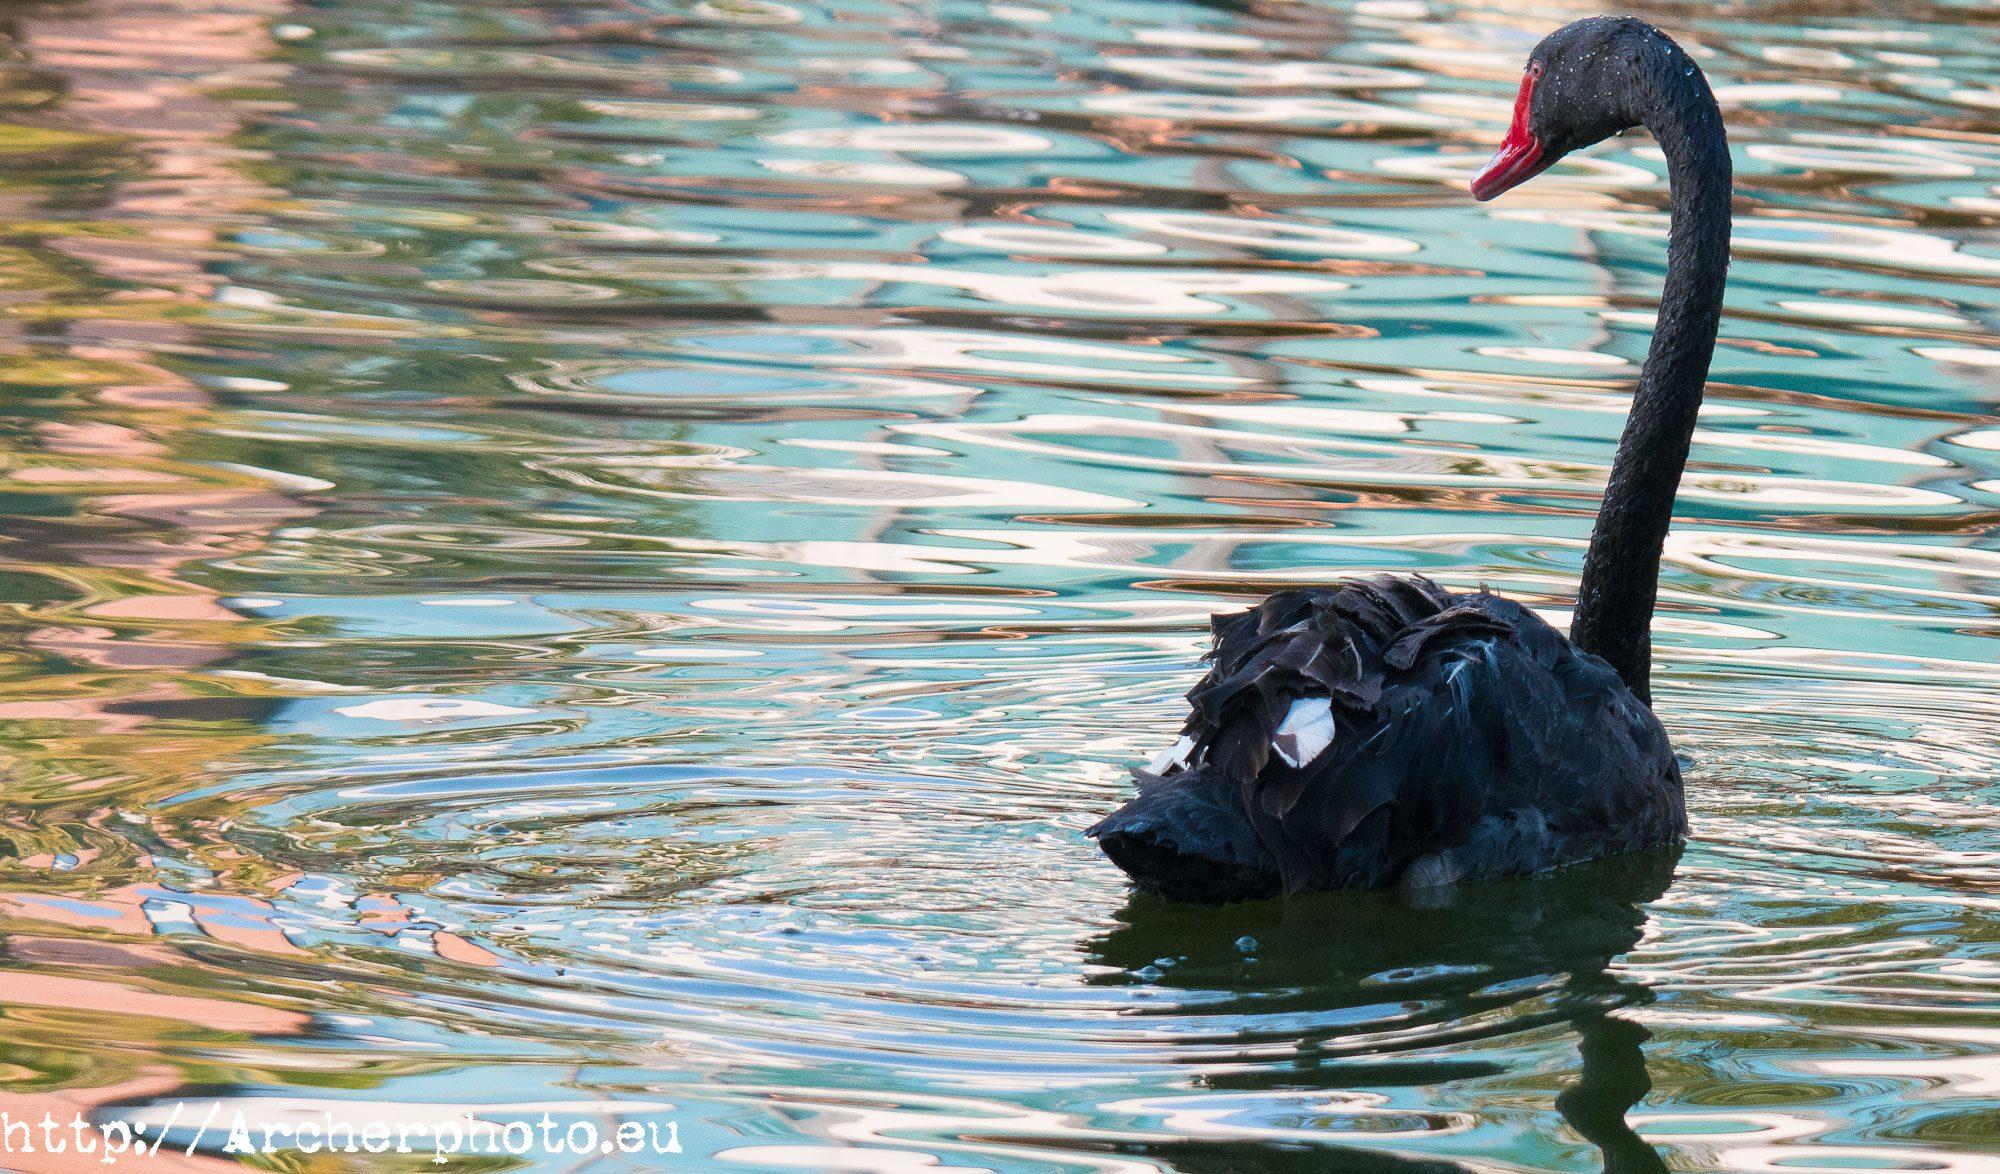 cisne negro por archerphoto fotógrafo valencia